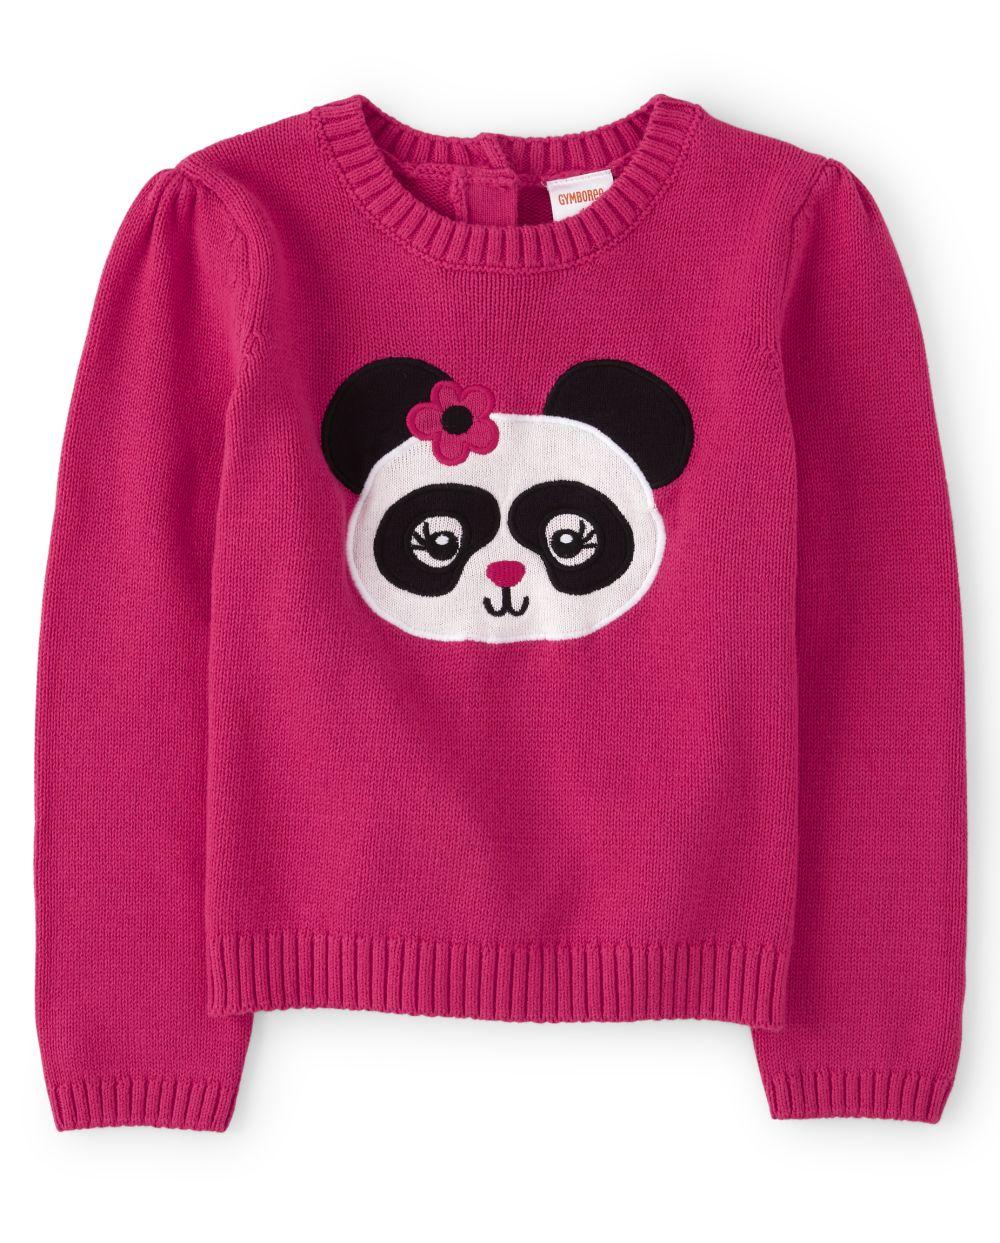 Girls Intarsia Sweater - Panda Party